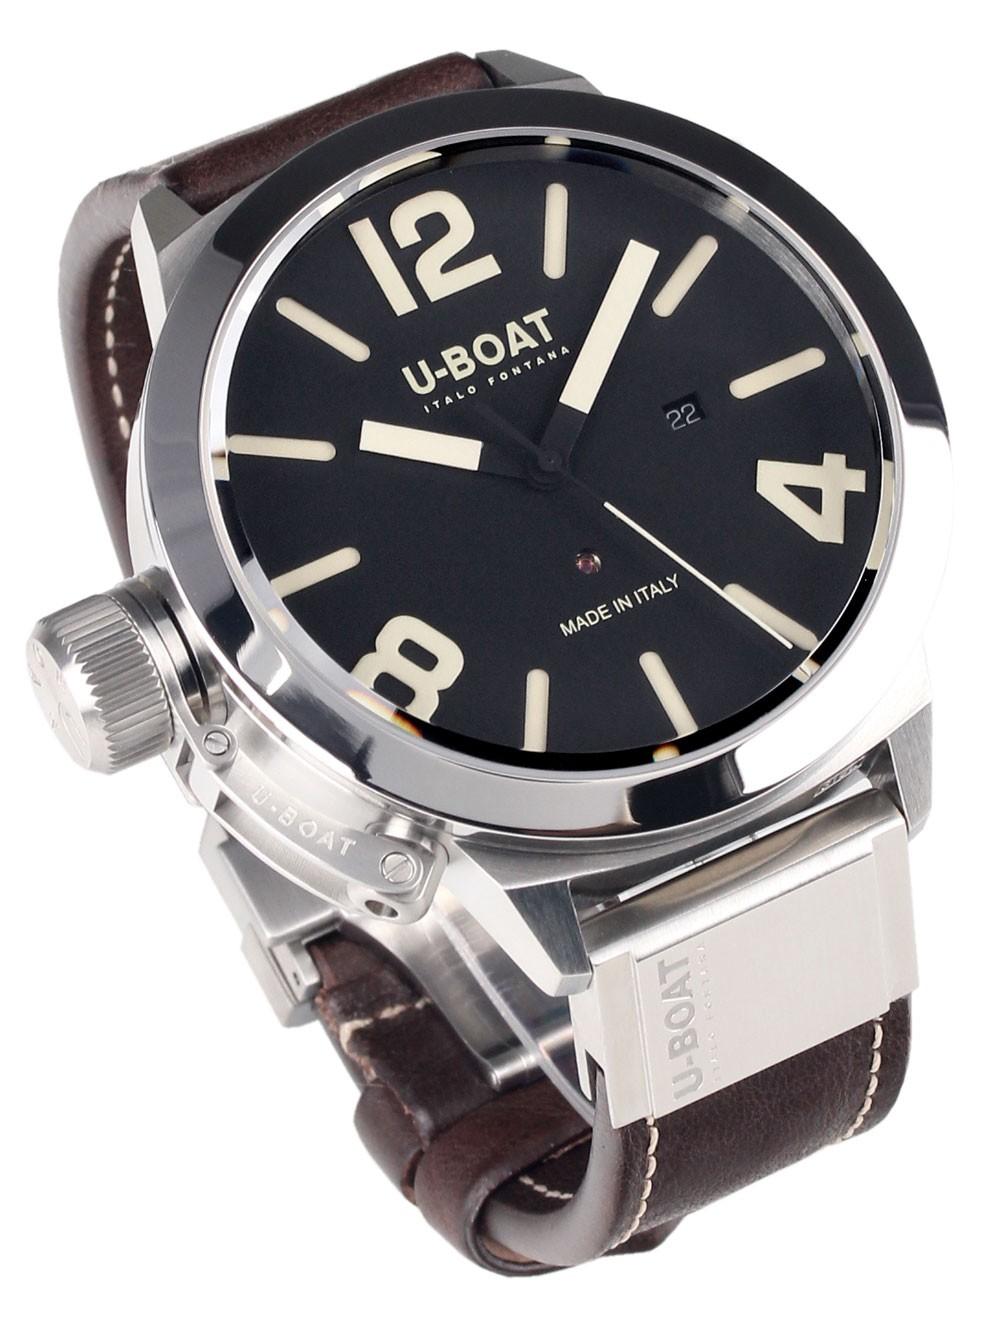 ceas barbatesc u-boat classico 7120 automat 53 mm